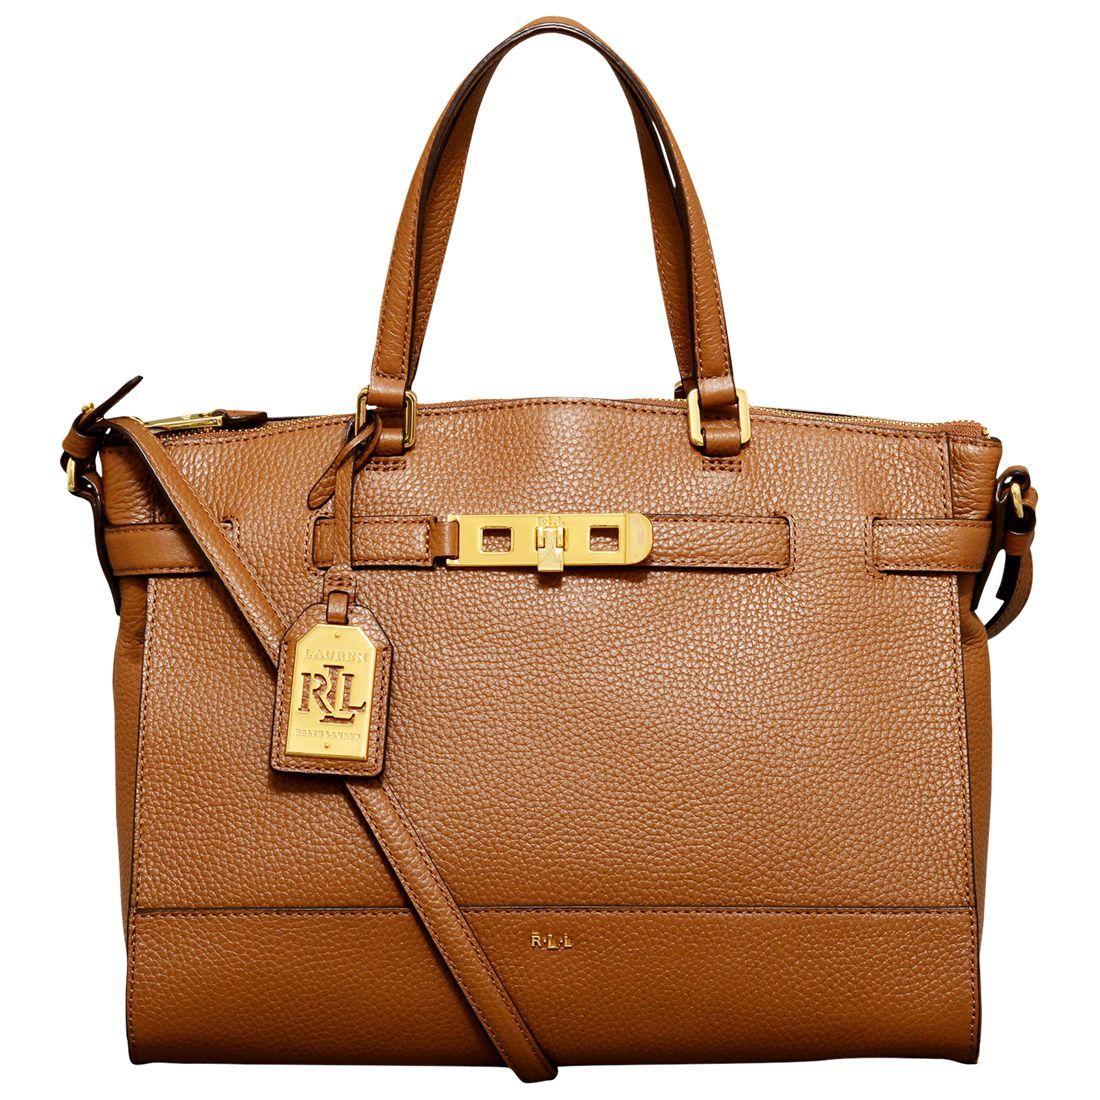 9015d6bbe67d ... coupon code for ralph lauren darwin bridle satchel handbag 3950d cc1a8